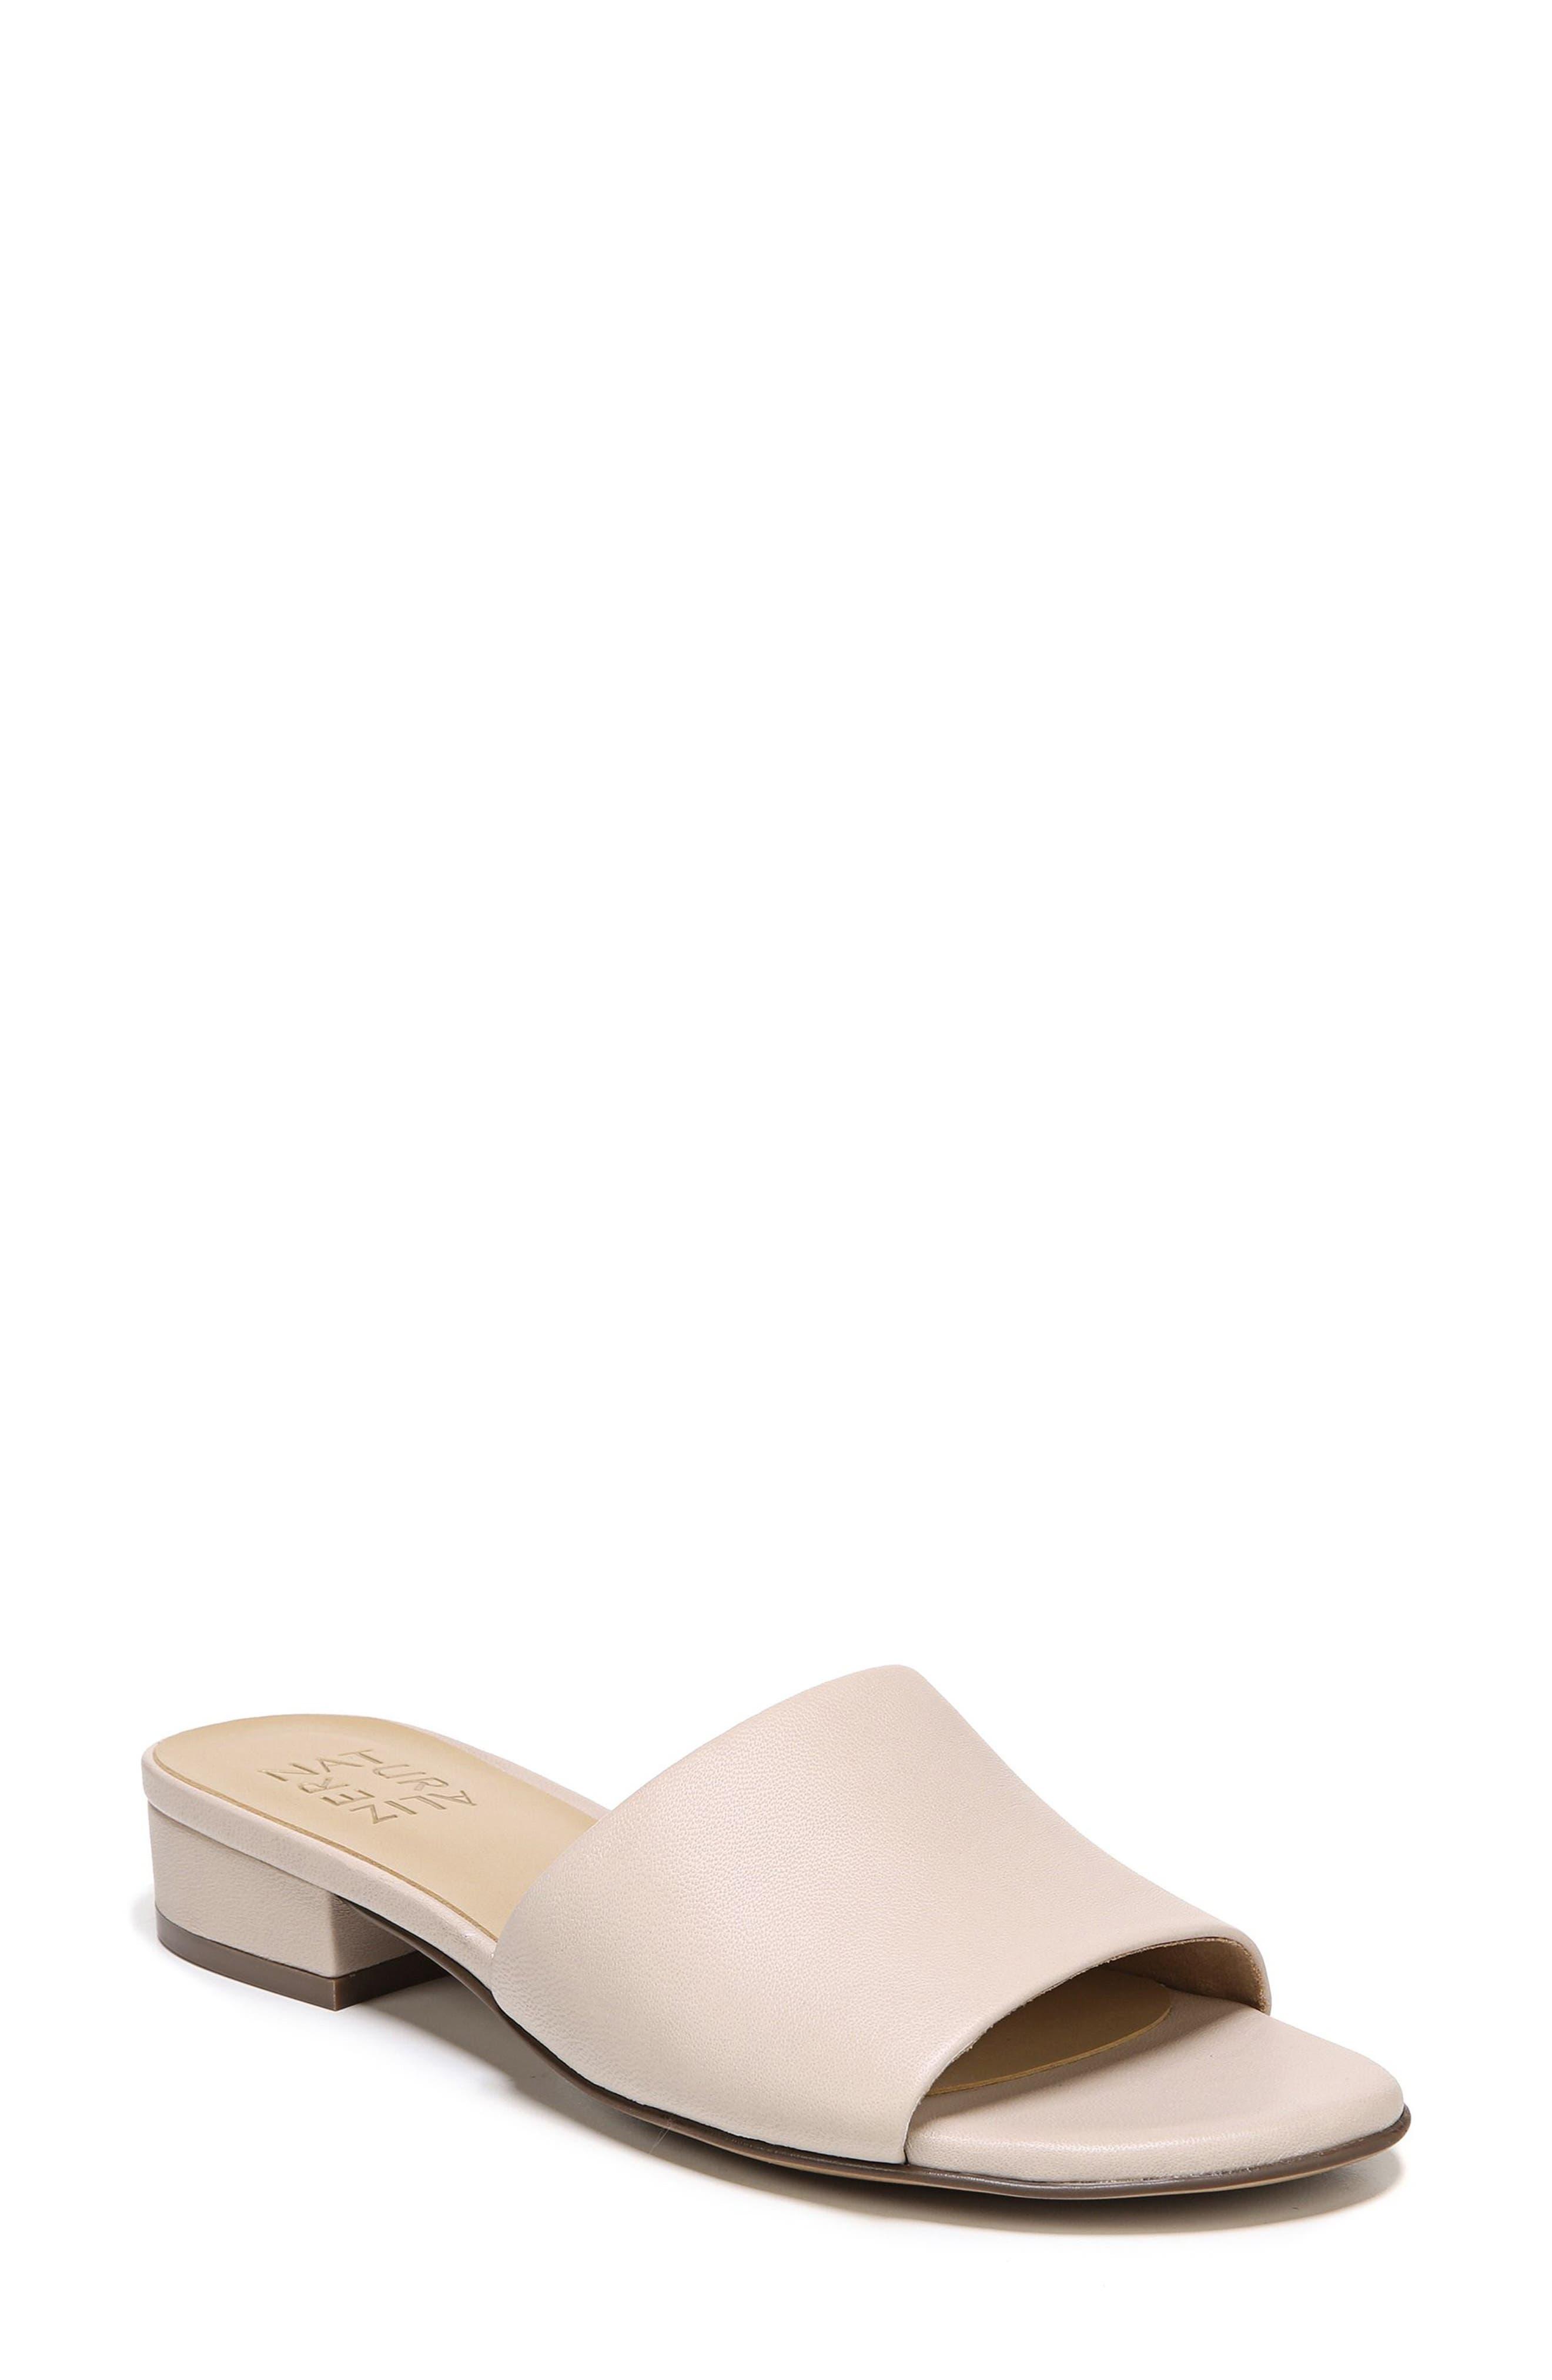 Mason Slide Sandal,                         Main,                         color, Grey Leather